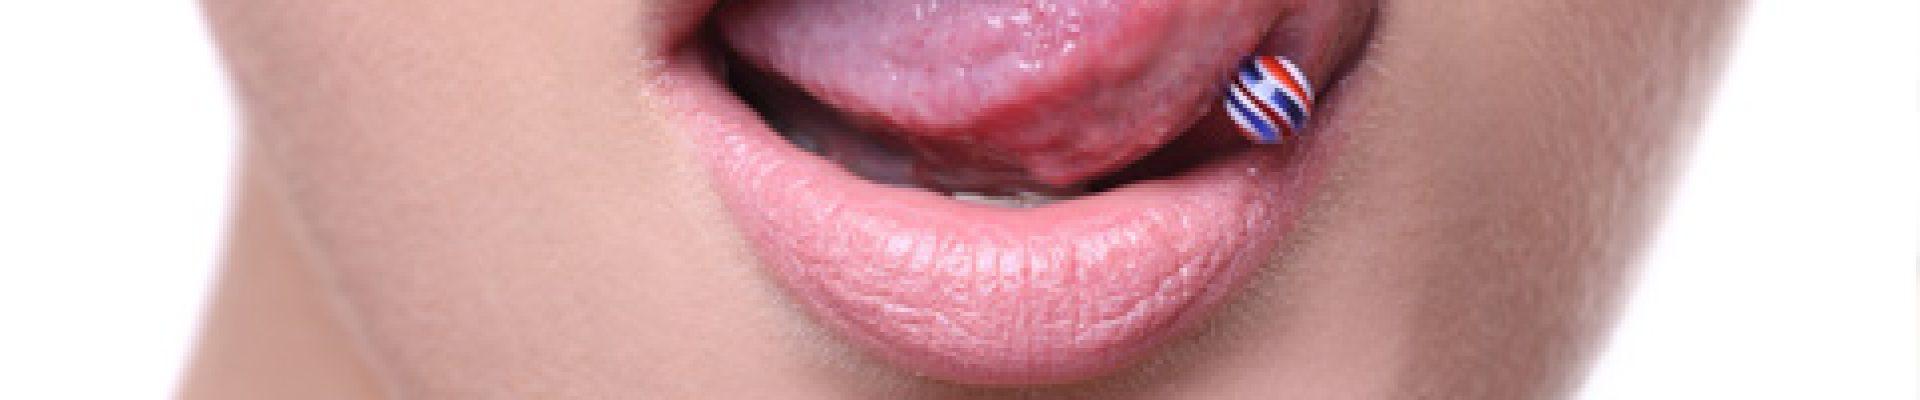 Achútegui-Dental-Piercing-Donostia-Dentista